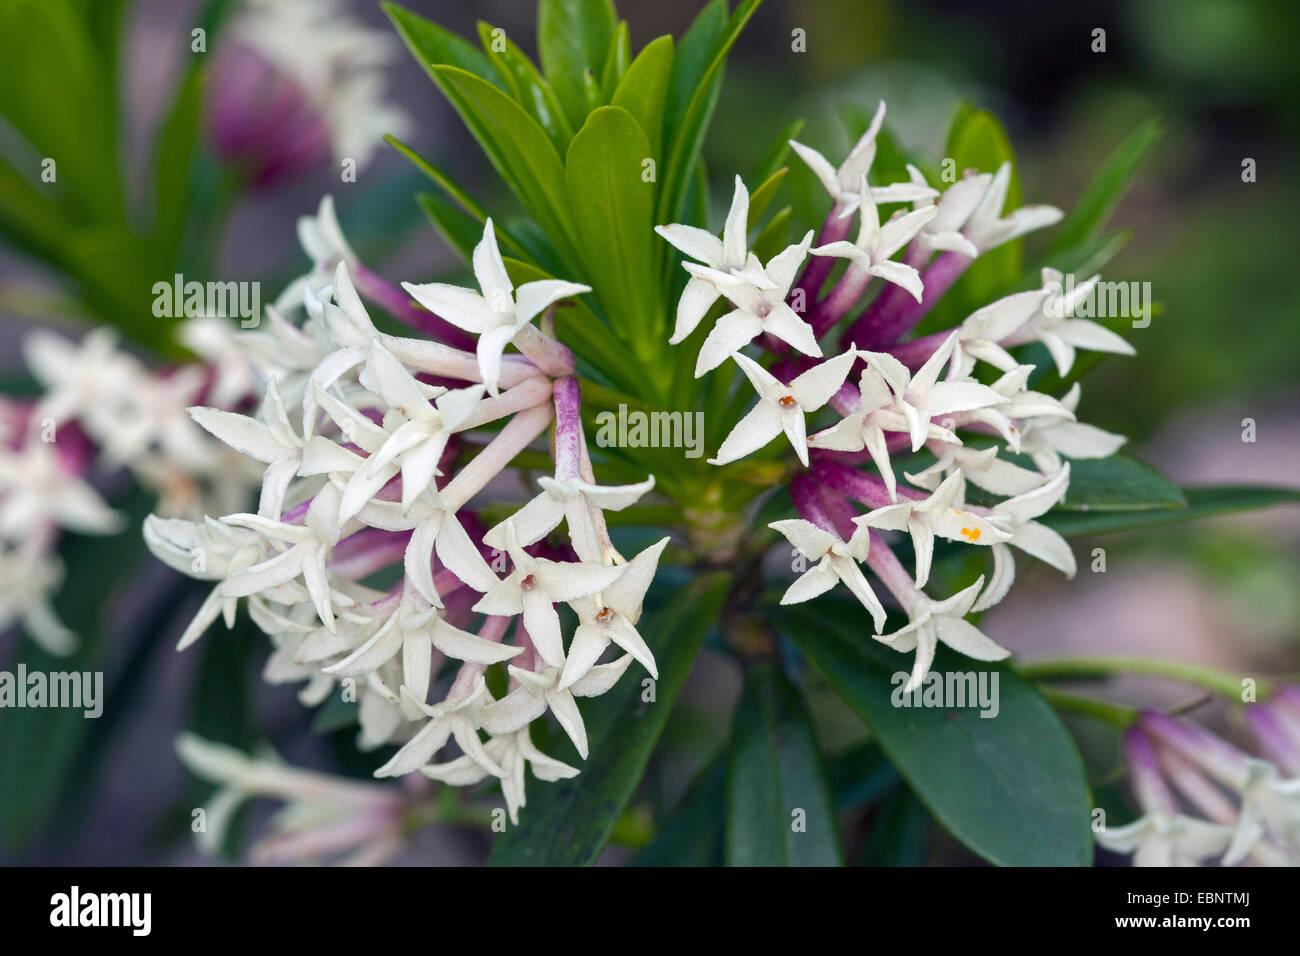 Blagay's Daphne, King's Rose, Balkan daphne (Daphne blagayana), blooming - Stock Image